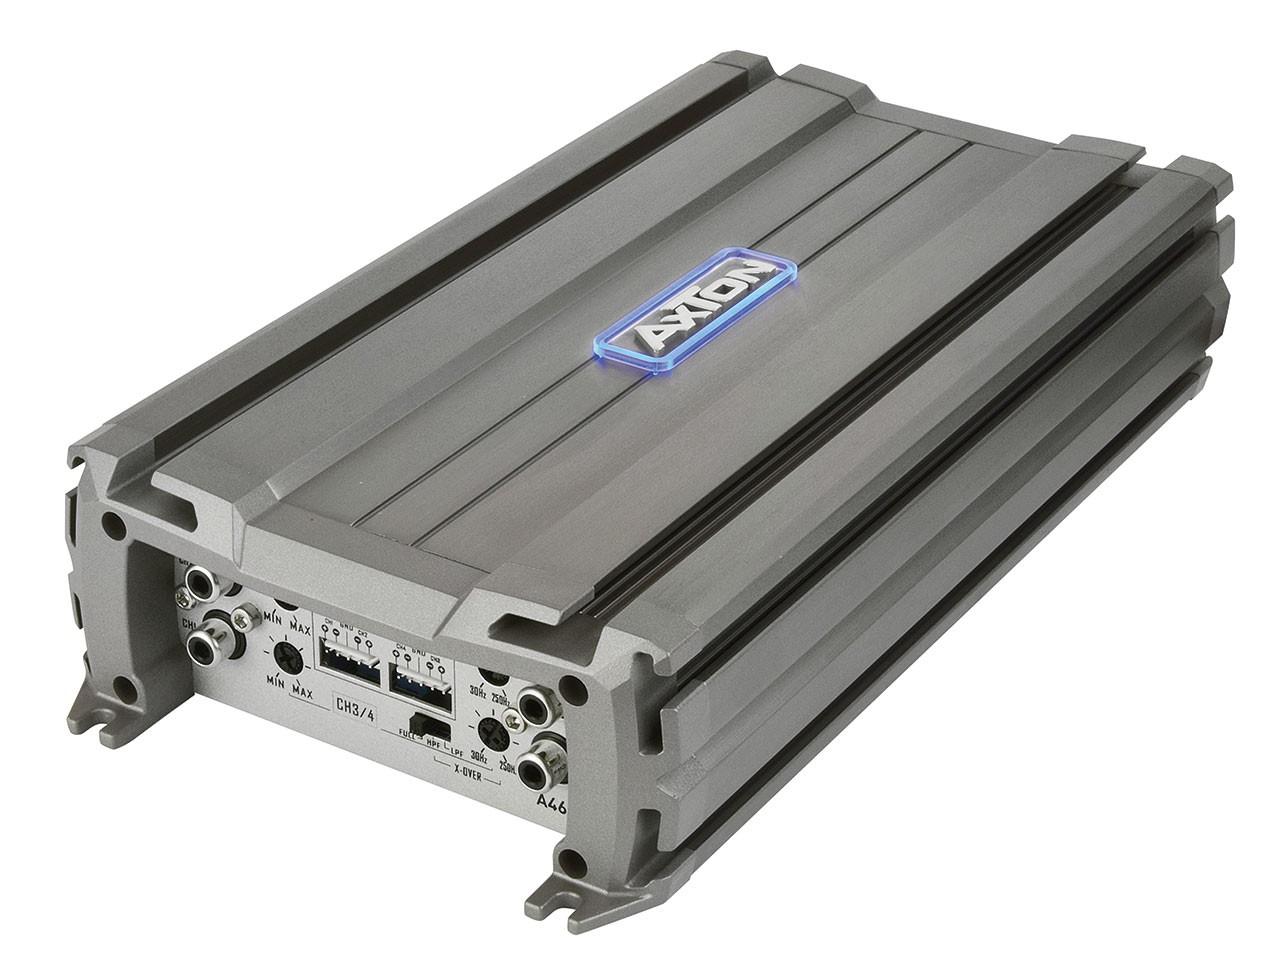 A460 - AXTON Amplifier 4 x 60 Watt